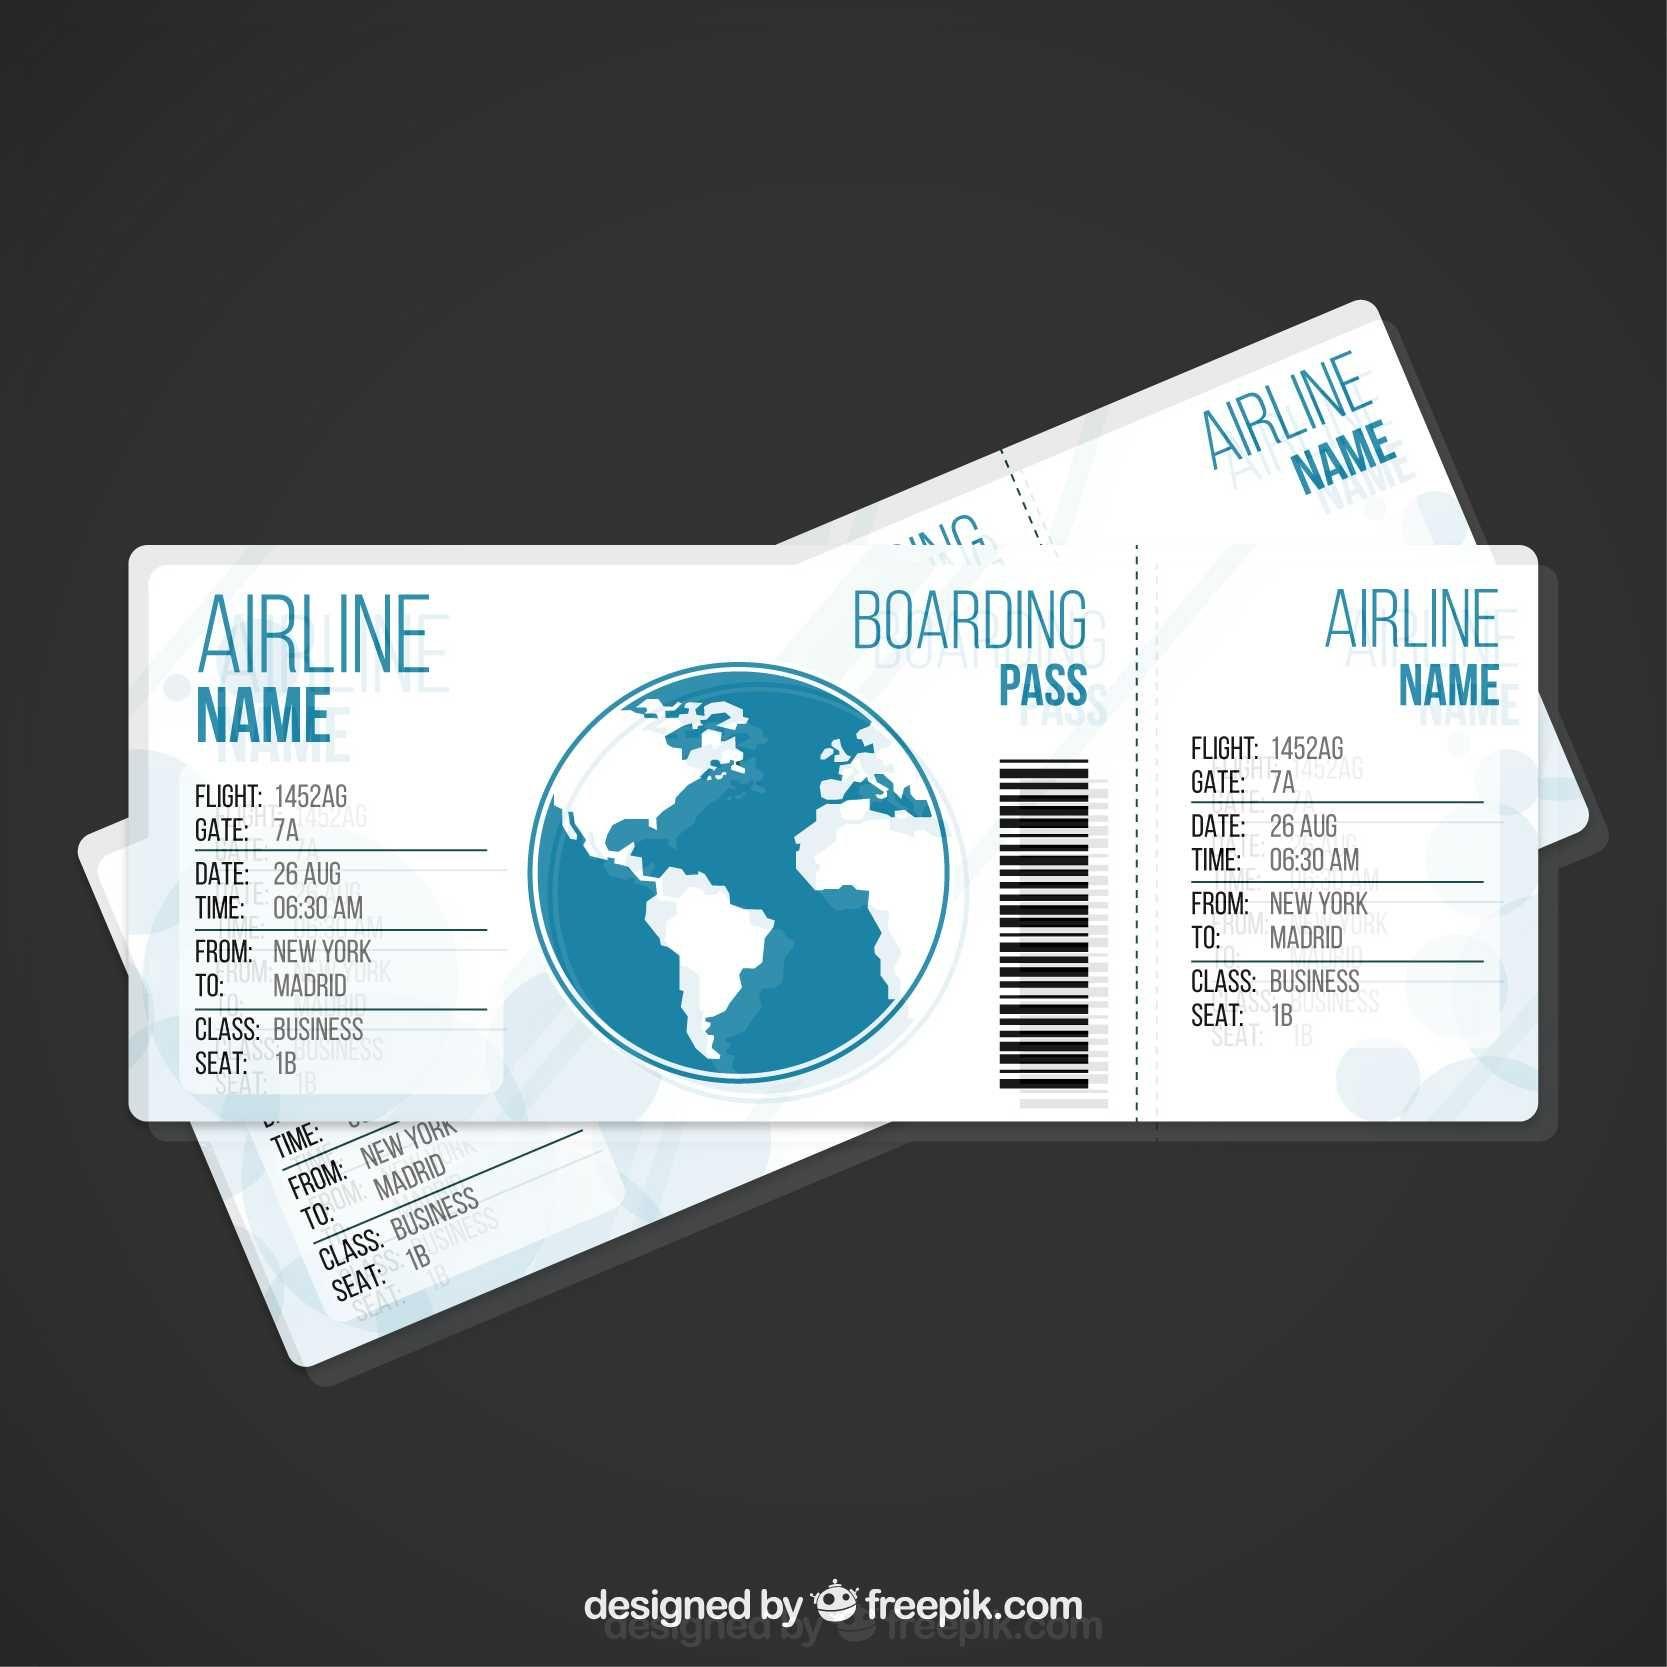 Airplane Ticket Template - FREE | Print Templates | Pinterest ...